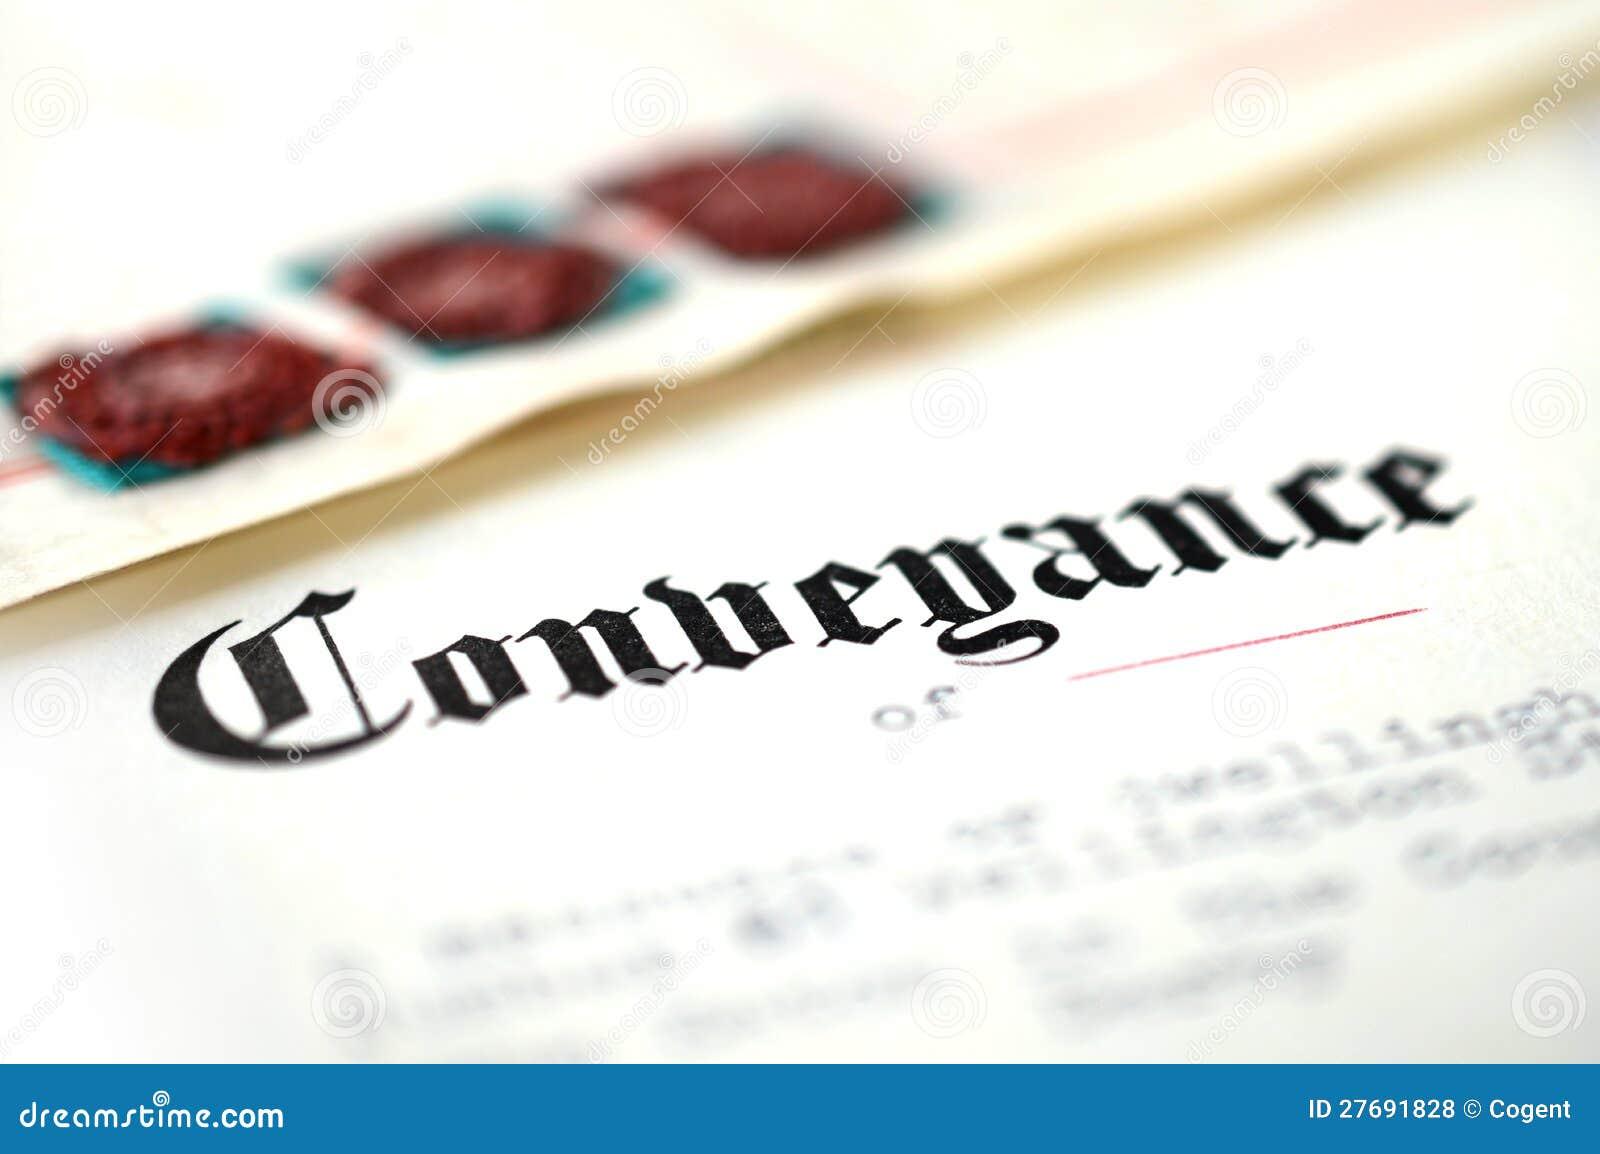 Conveyance Document Royalty Free Stock Photos Image